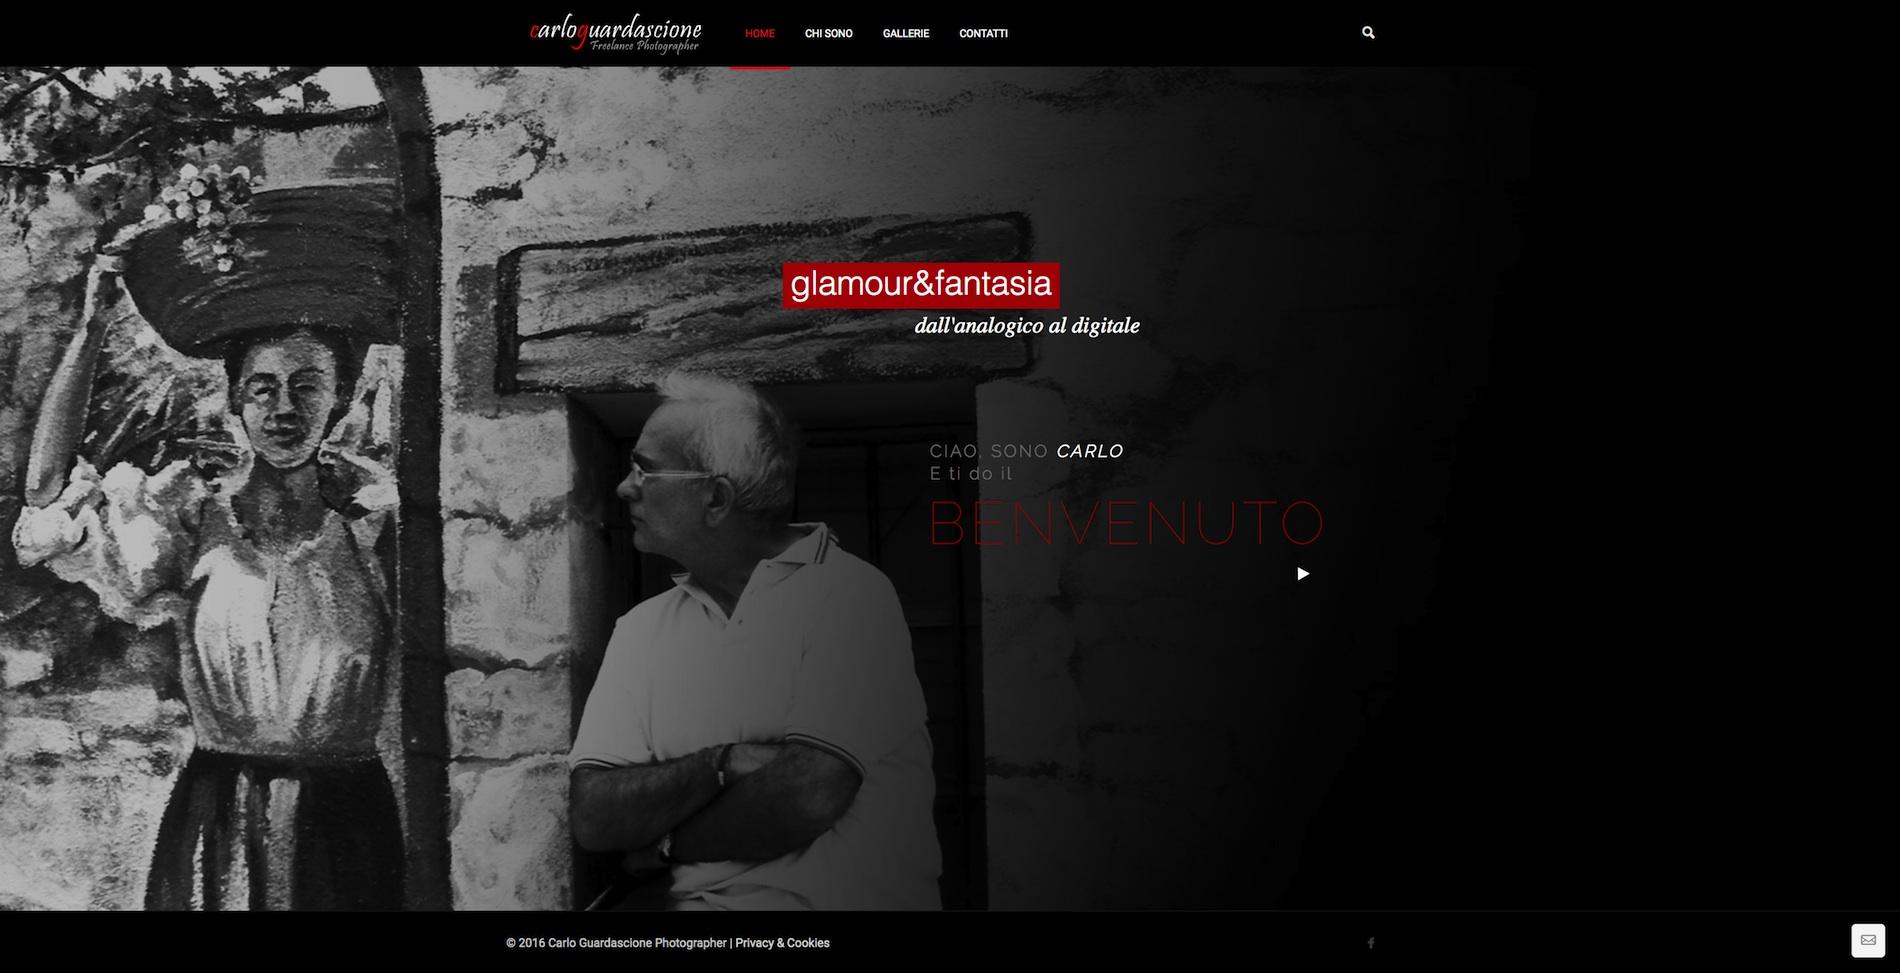 carlo-guardascione-freelance-photographer-napoli-2016-10-18-15-03-36